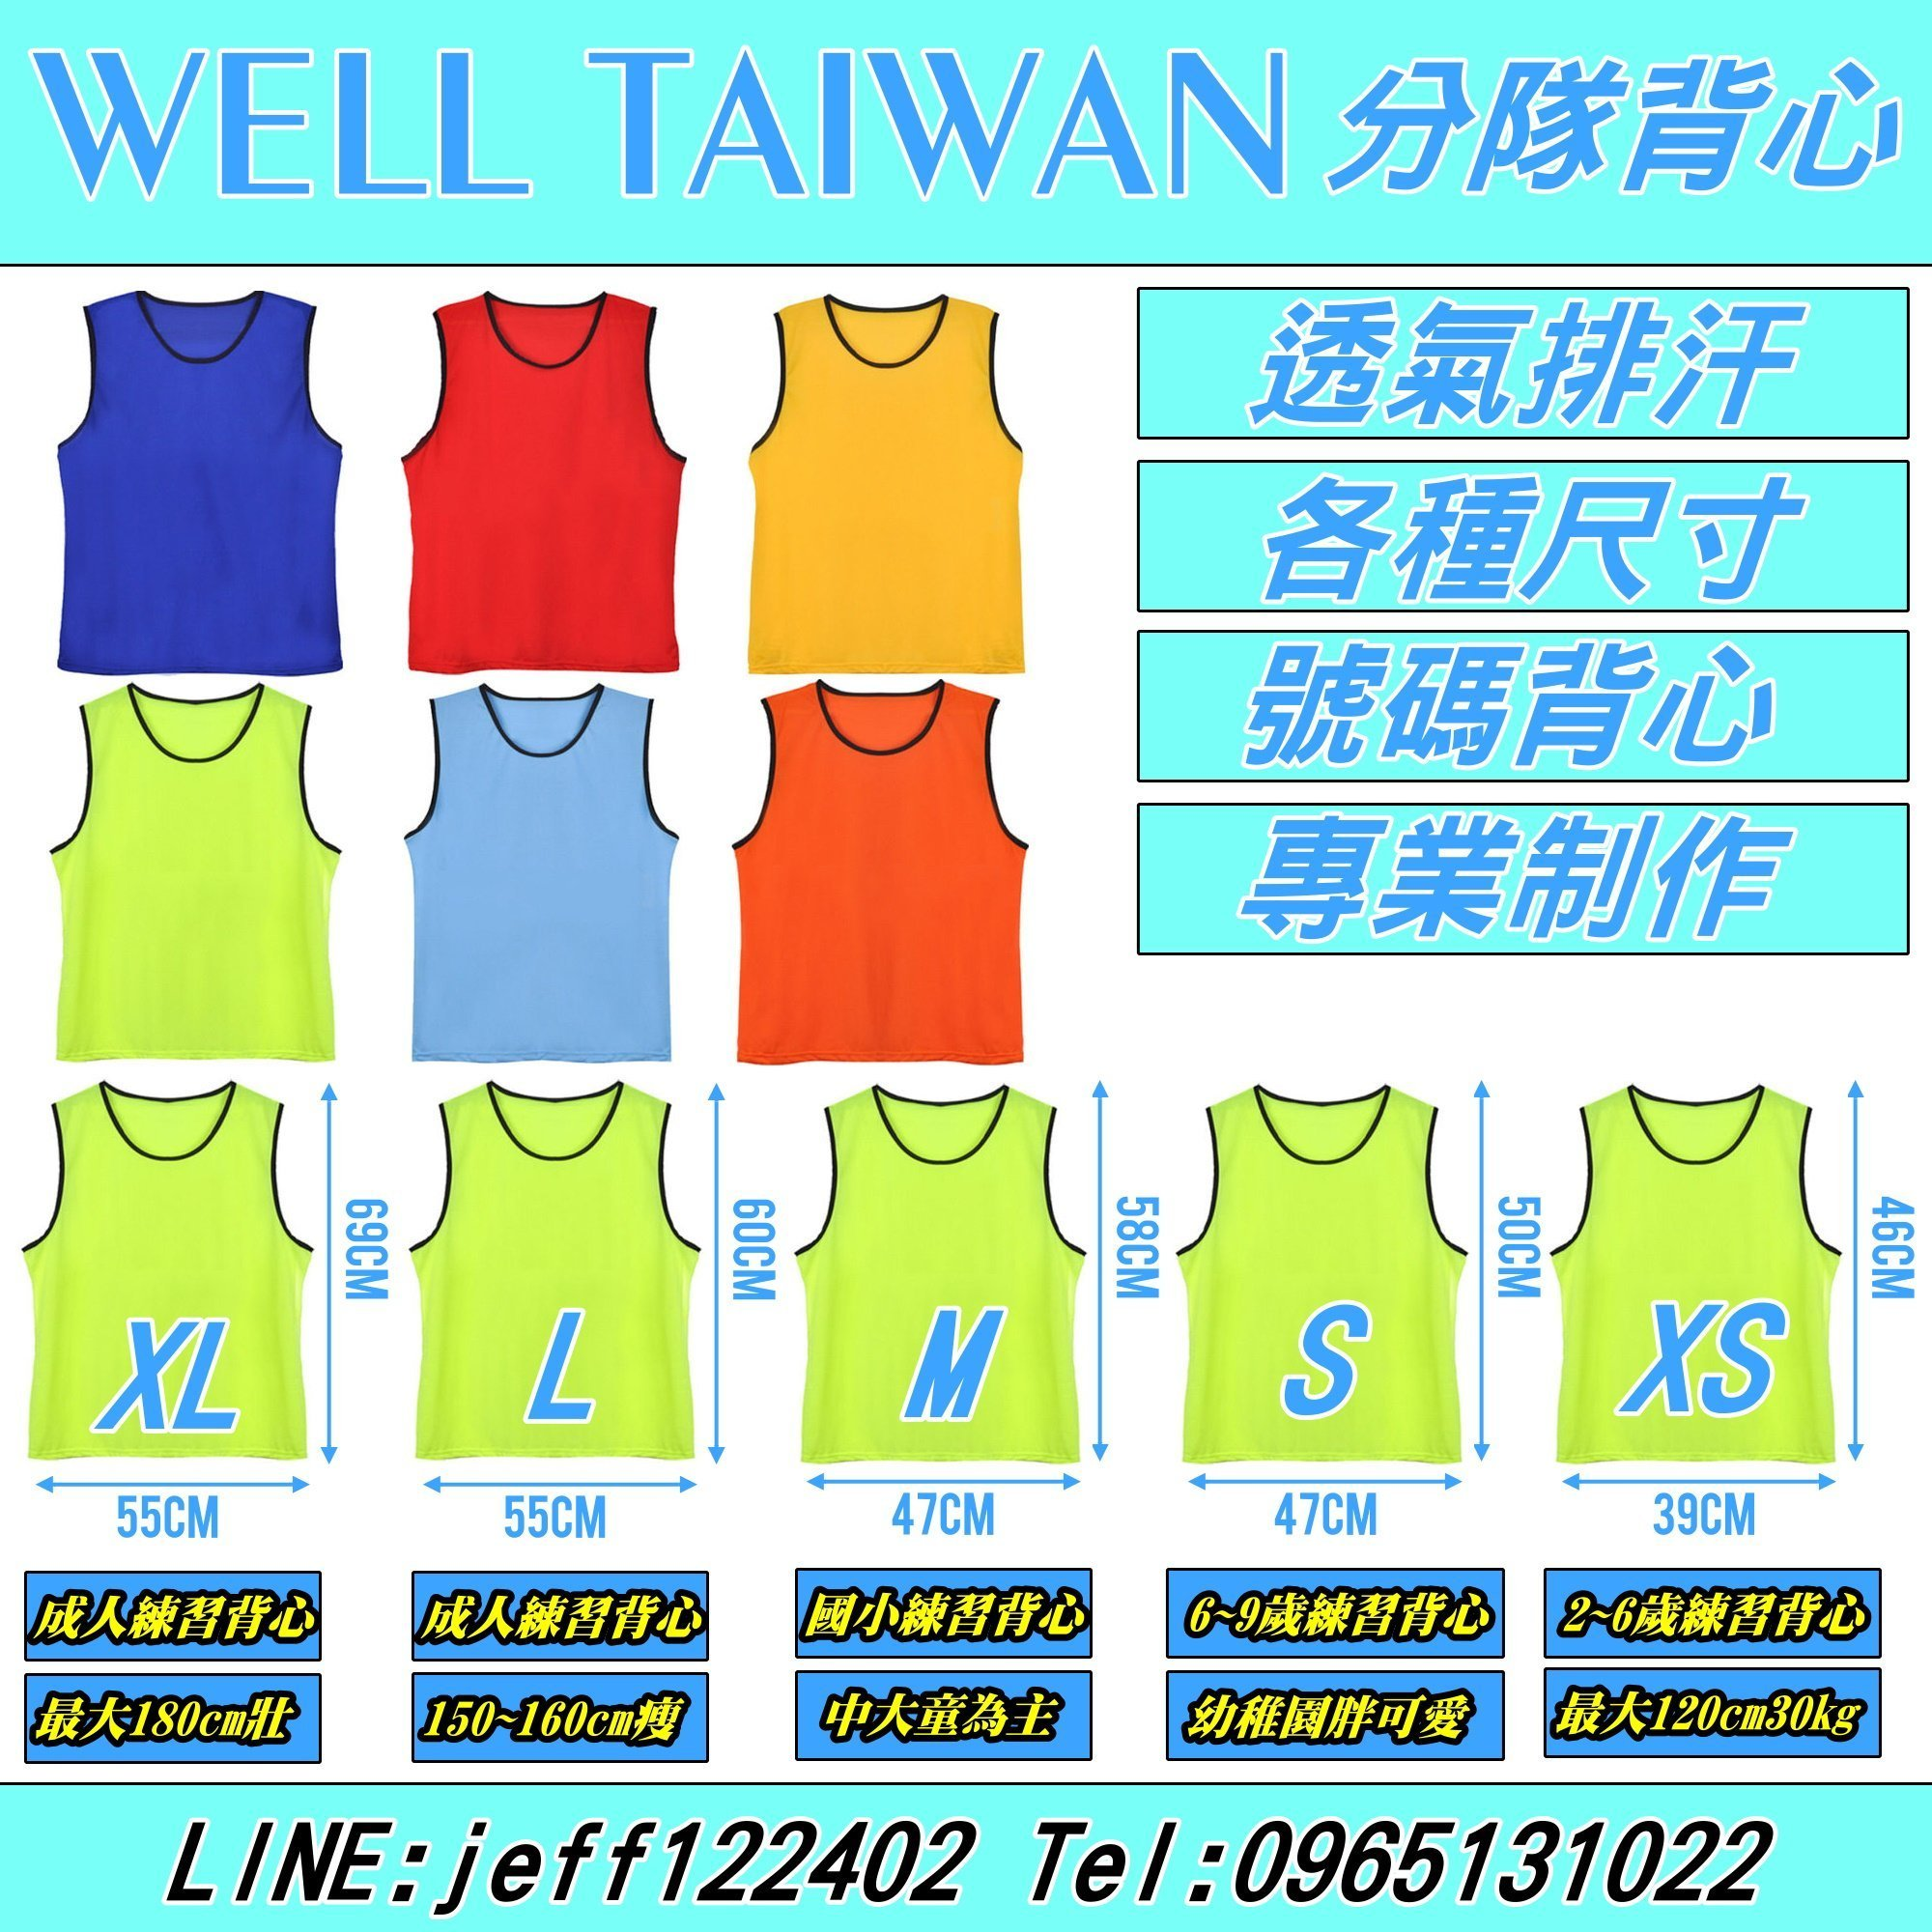 WELL.TAIWAN分隊背心(3XS~2XL) 比賽背心號碼背心訓練背心(3XS~2XL) 足球賽籃球賽手球賽各種比賽